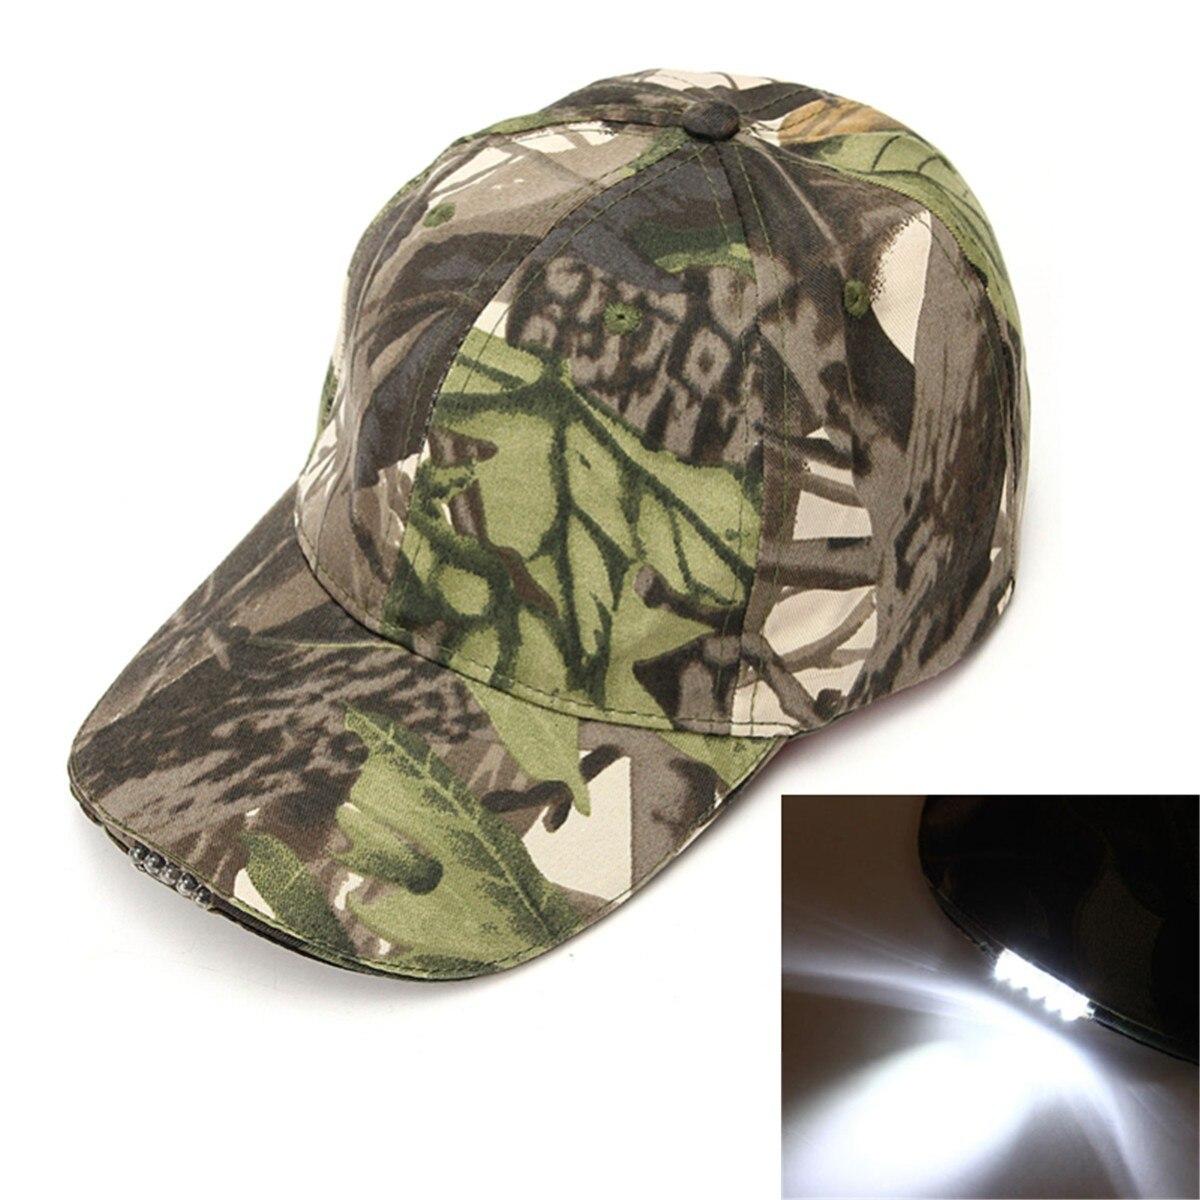 LED Headlamp Baseball Cap Light 5LED Torch Camouflage Hat With LED Head Light Flashlight For Bicycle Night Fishing Running недорго, оригинальная цена